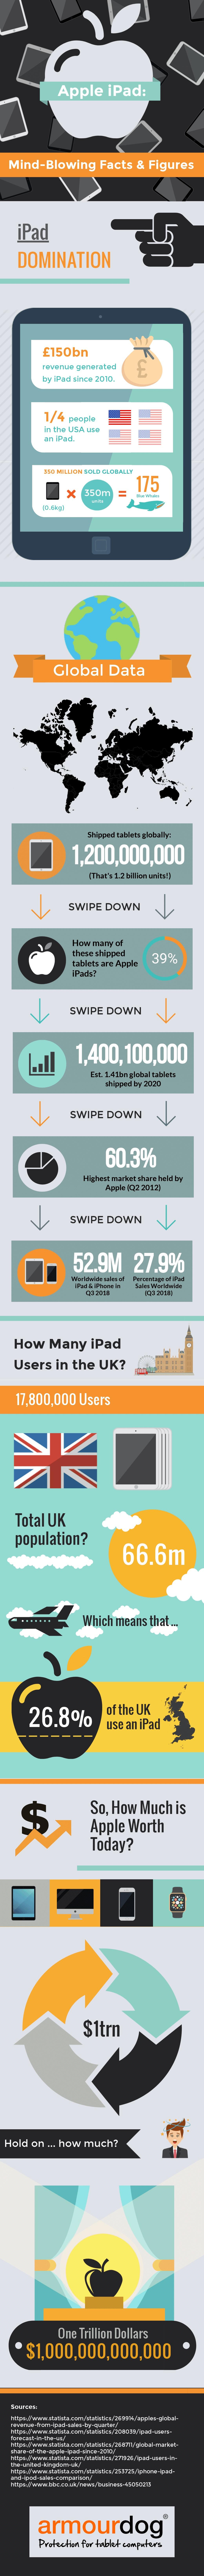 iPad Figures info